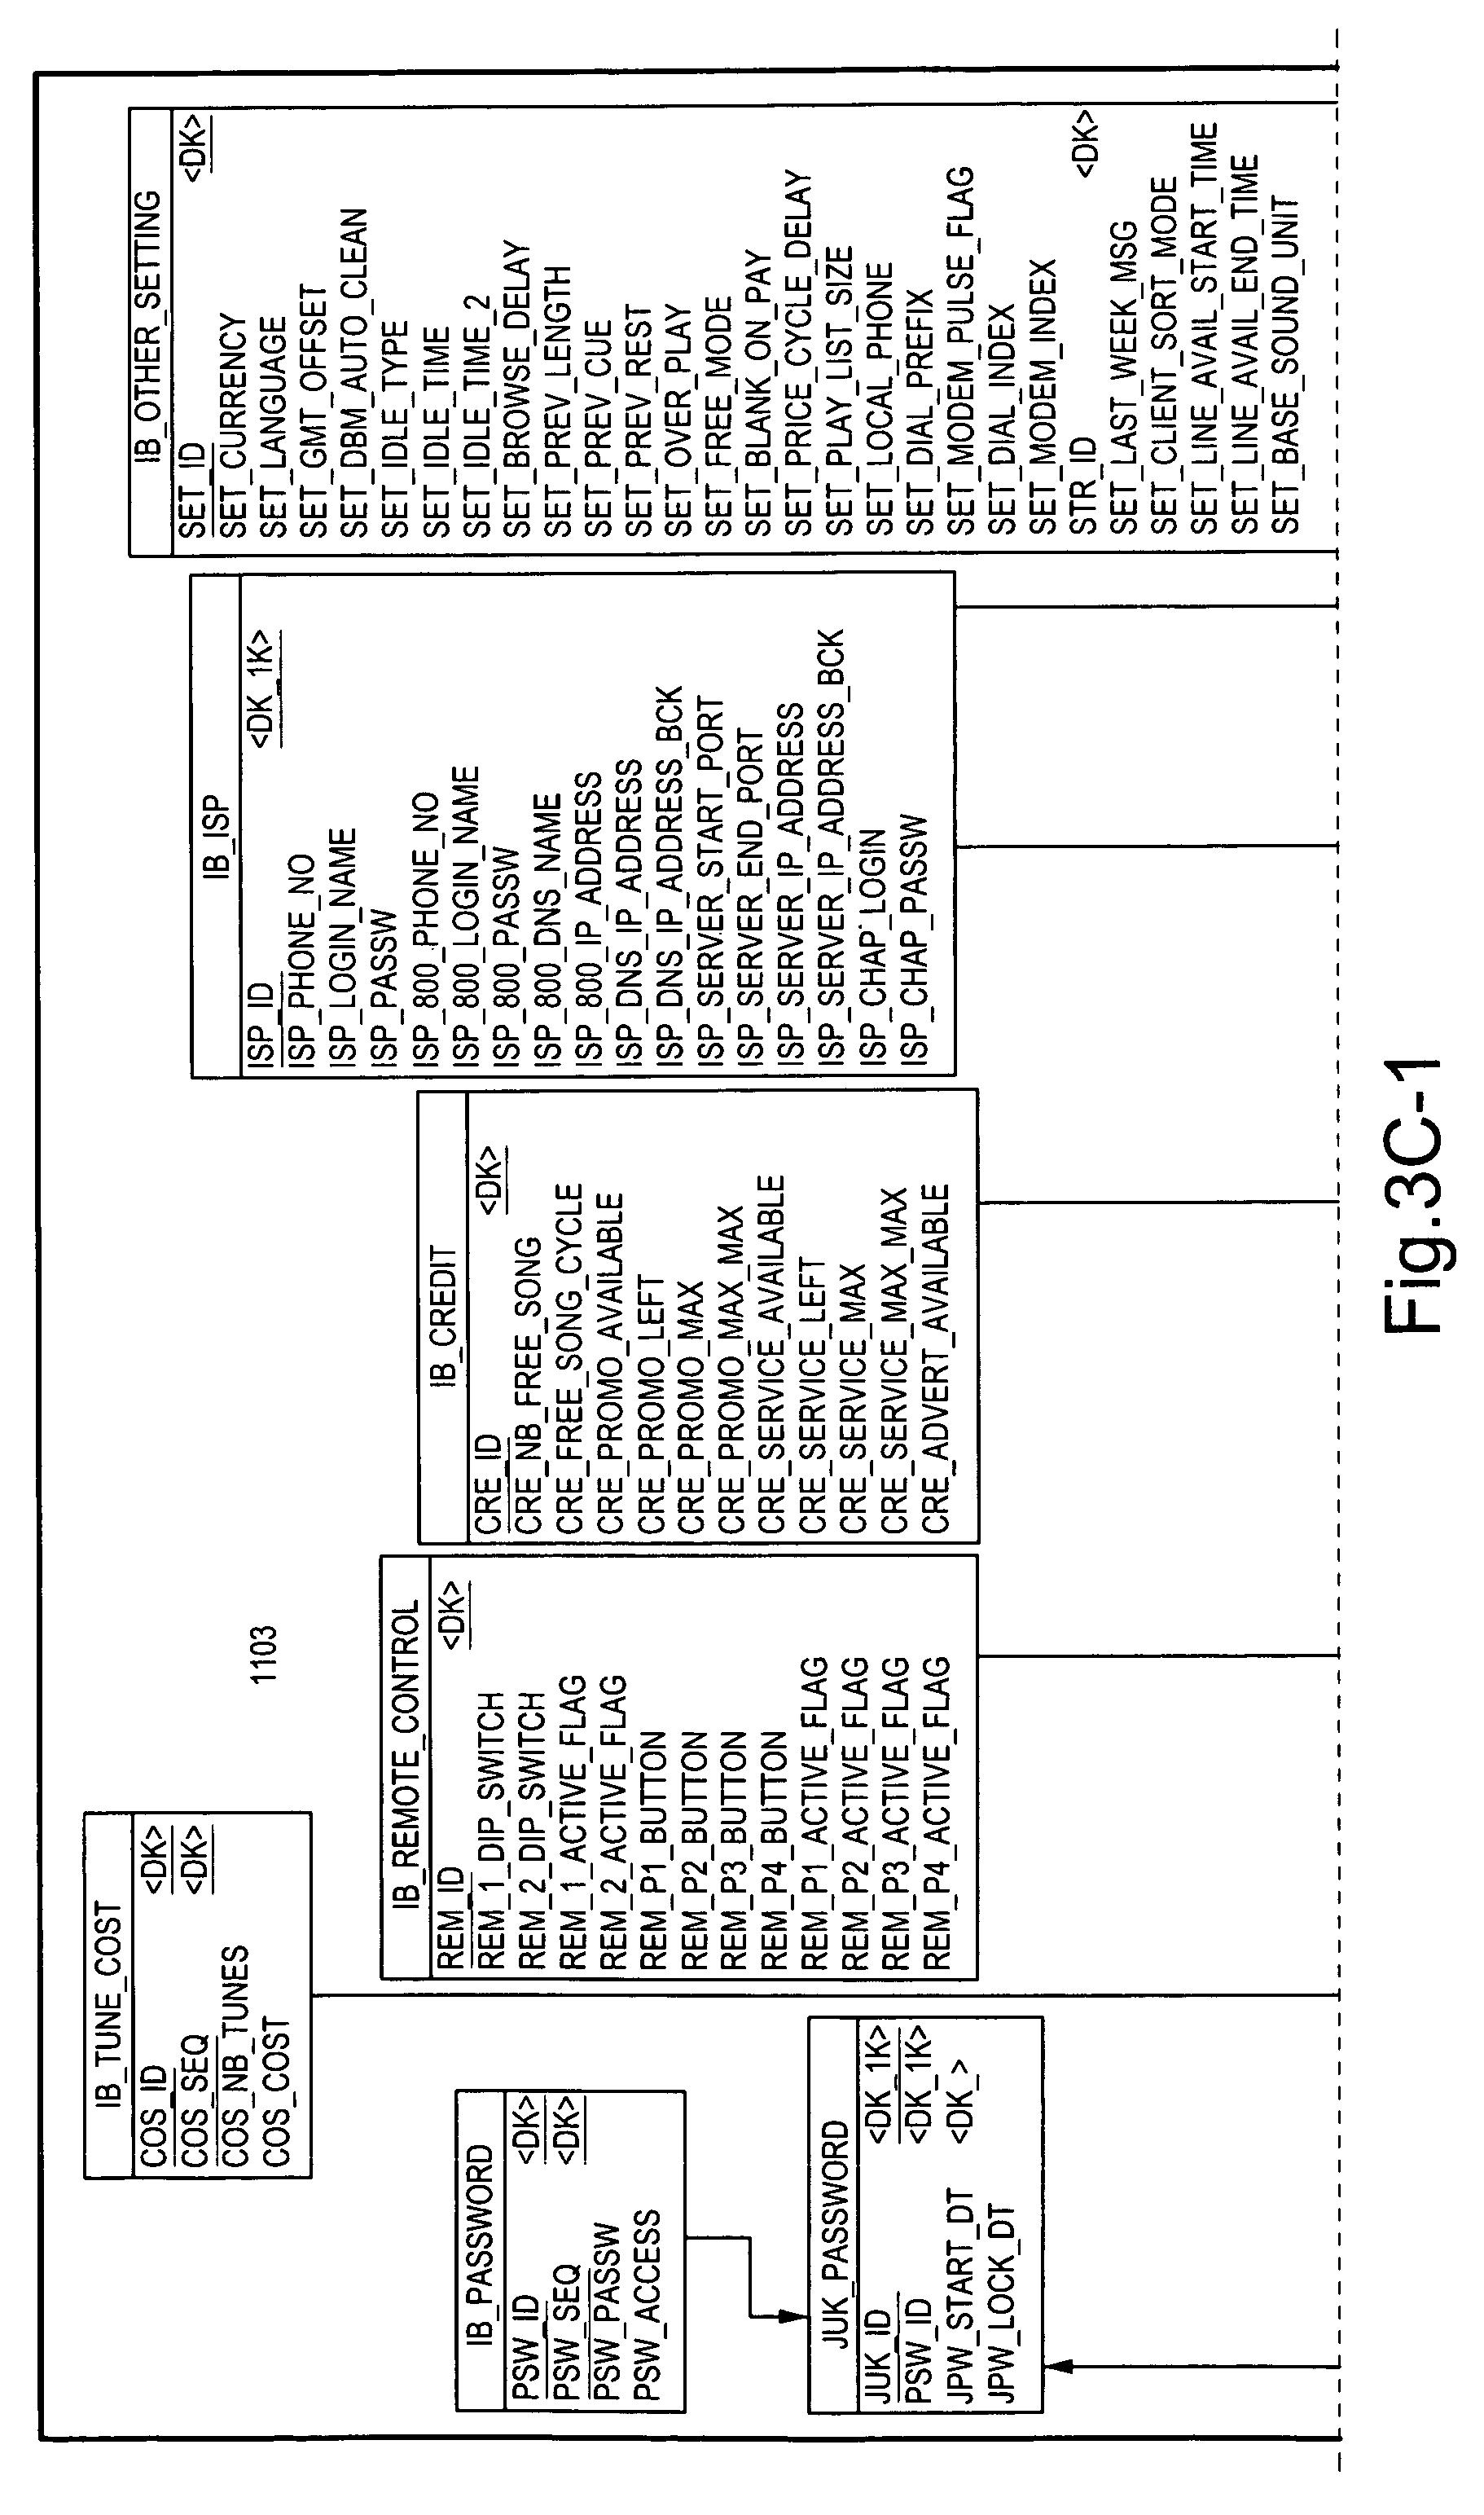 Sahara Protocol Qualcomm Error